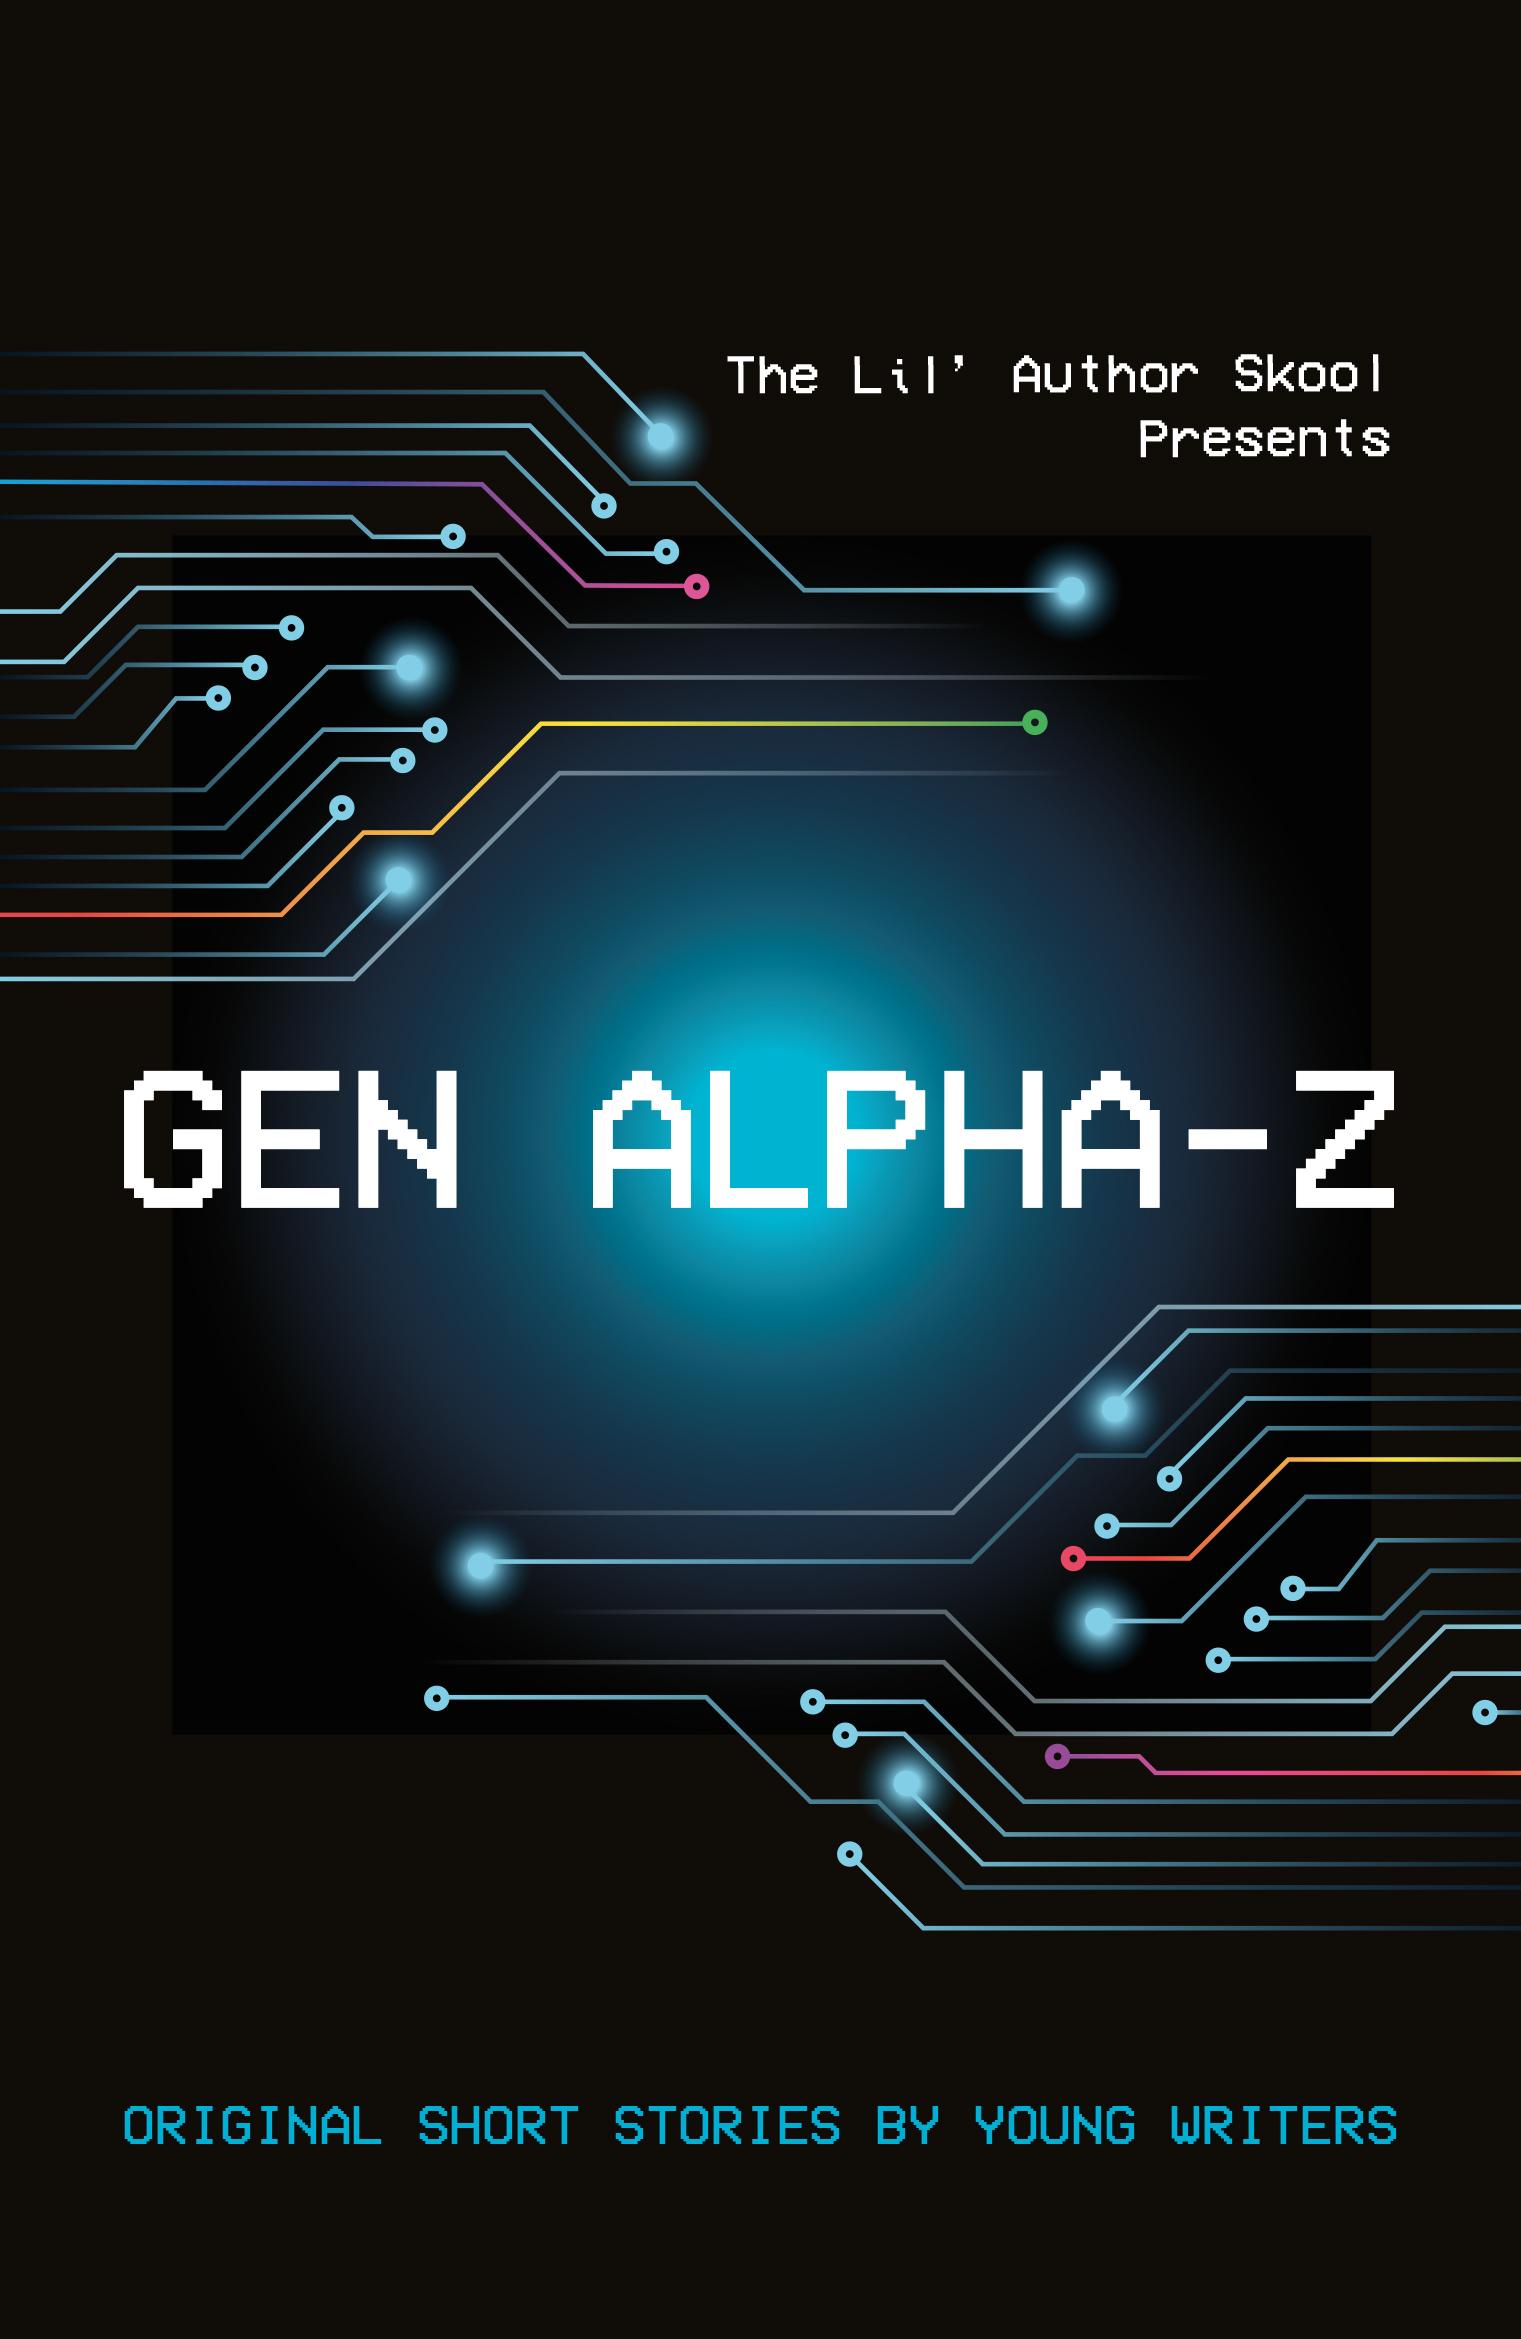 Pre-order Gen Alpha Z - @lilauthorskool